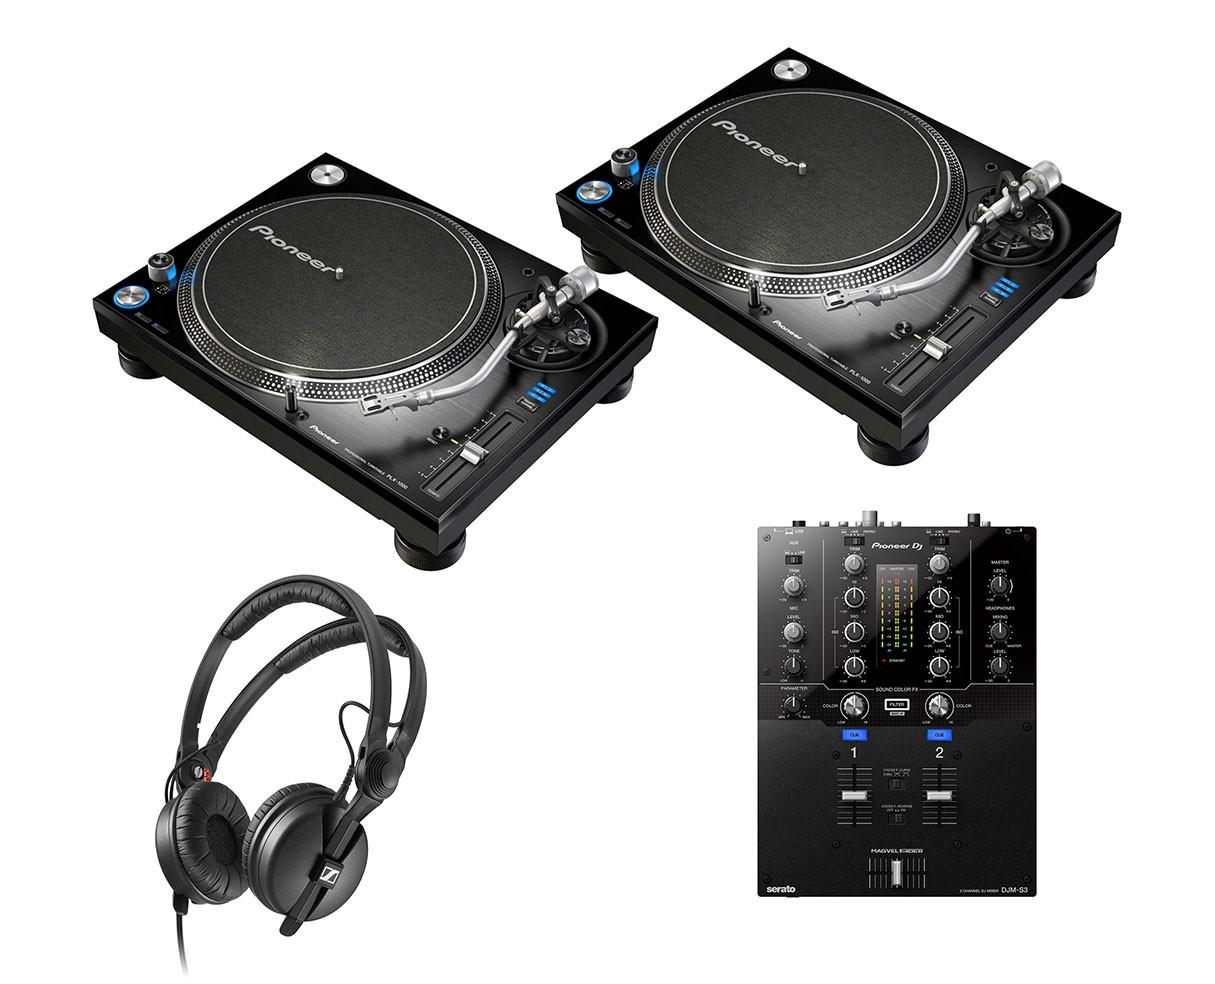 2x Pioneer PLX-1000 + DJM-S3 + HD 25